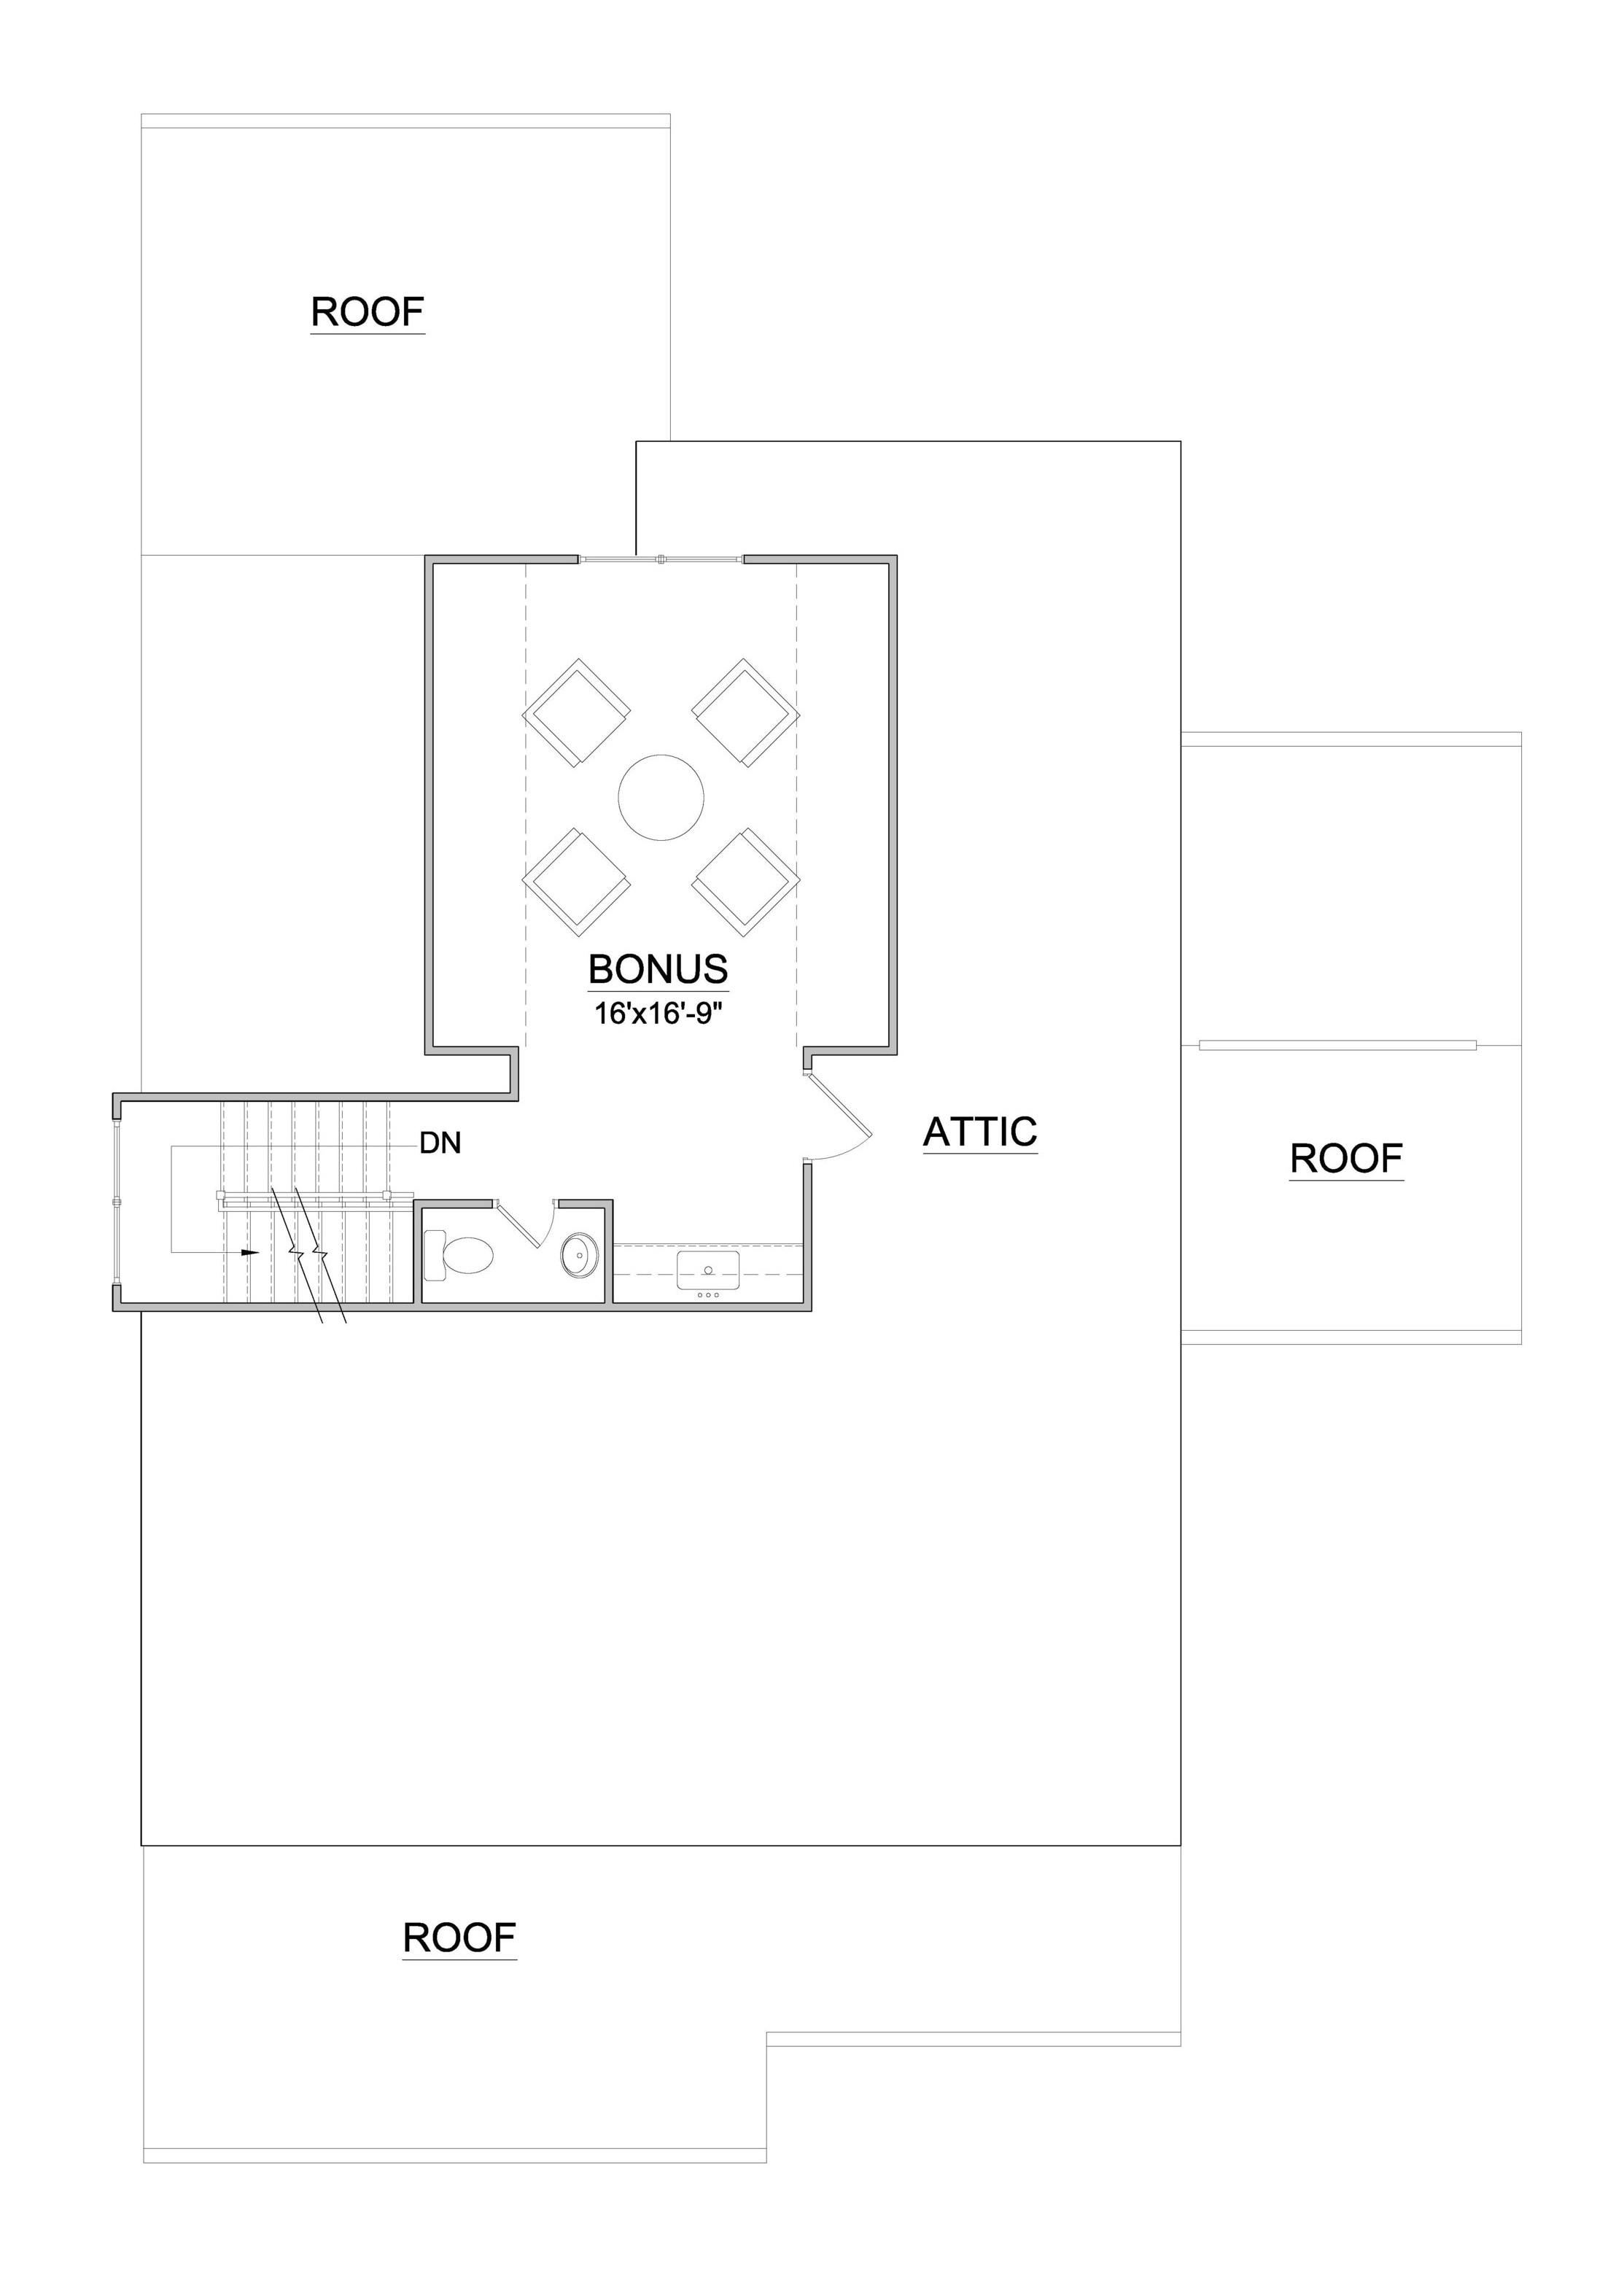 CC_Third Floor_24x36.jpg